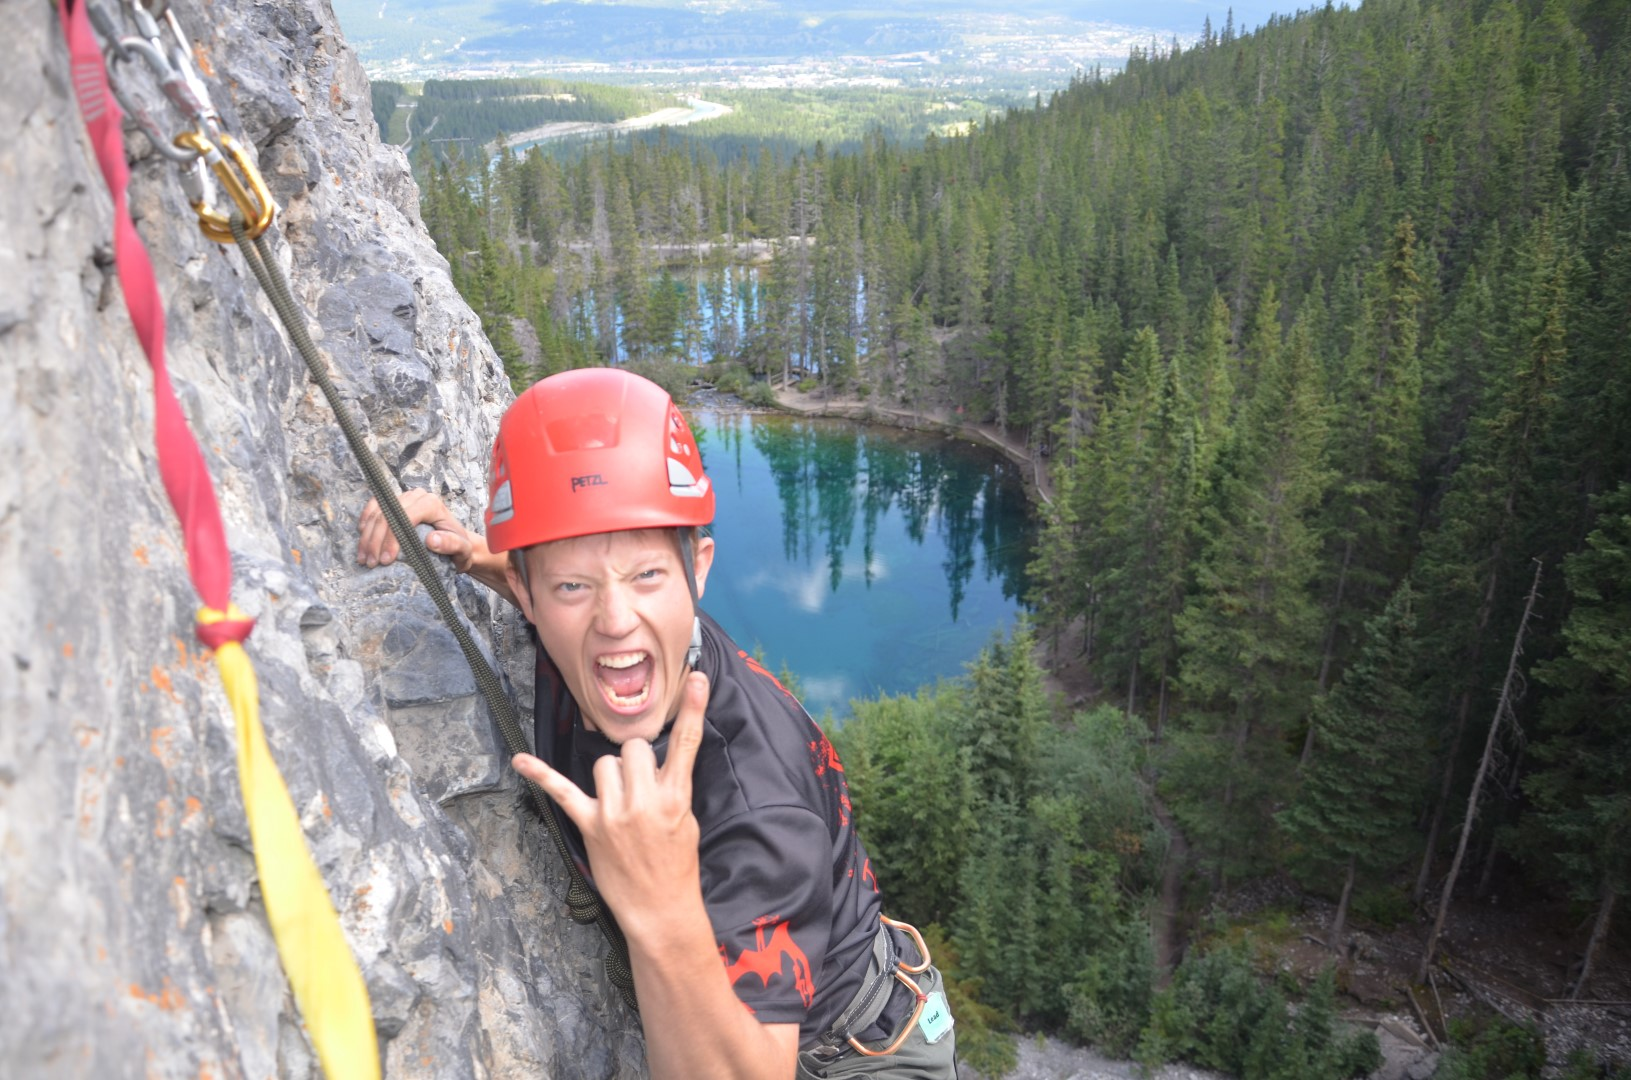 Rock Climbing with Type 1 Diabetes